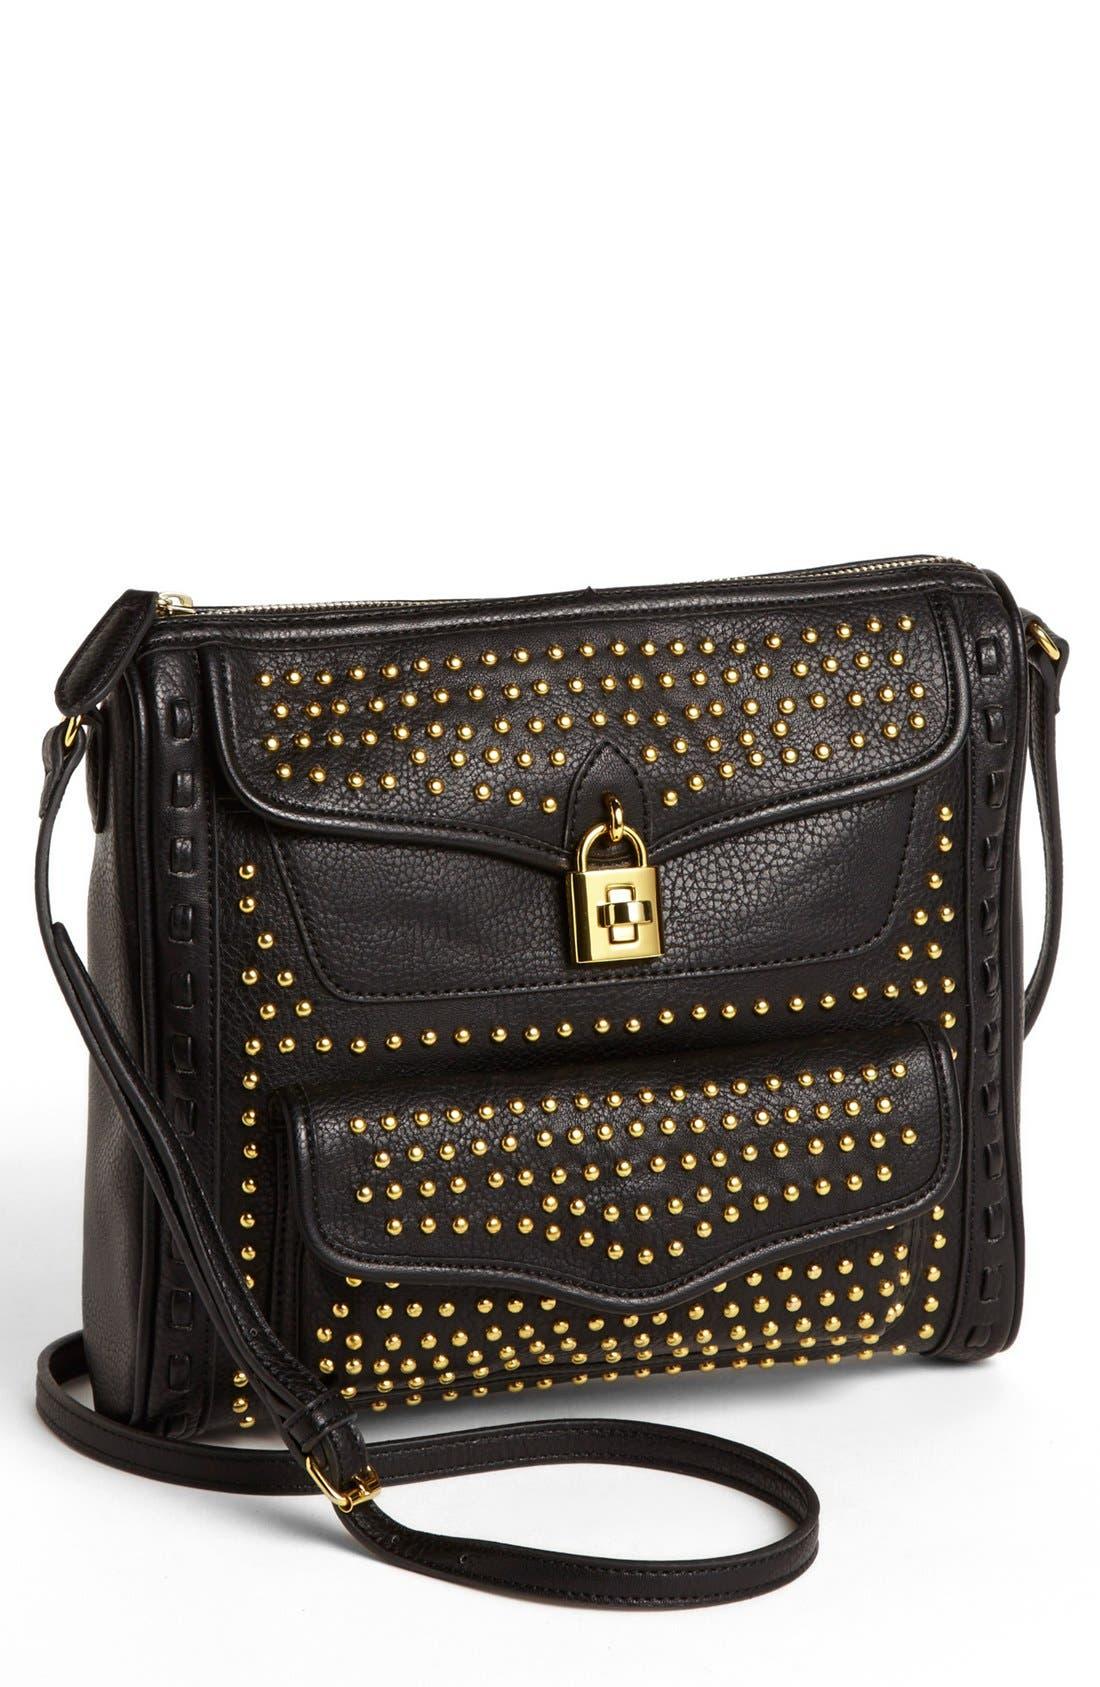 Alternate Image 1 Selected - Jessica Simpson 'Madison' Pebble Studded Crossbody Bag